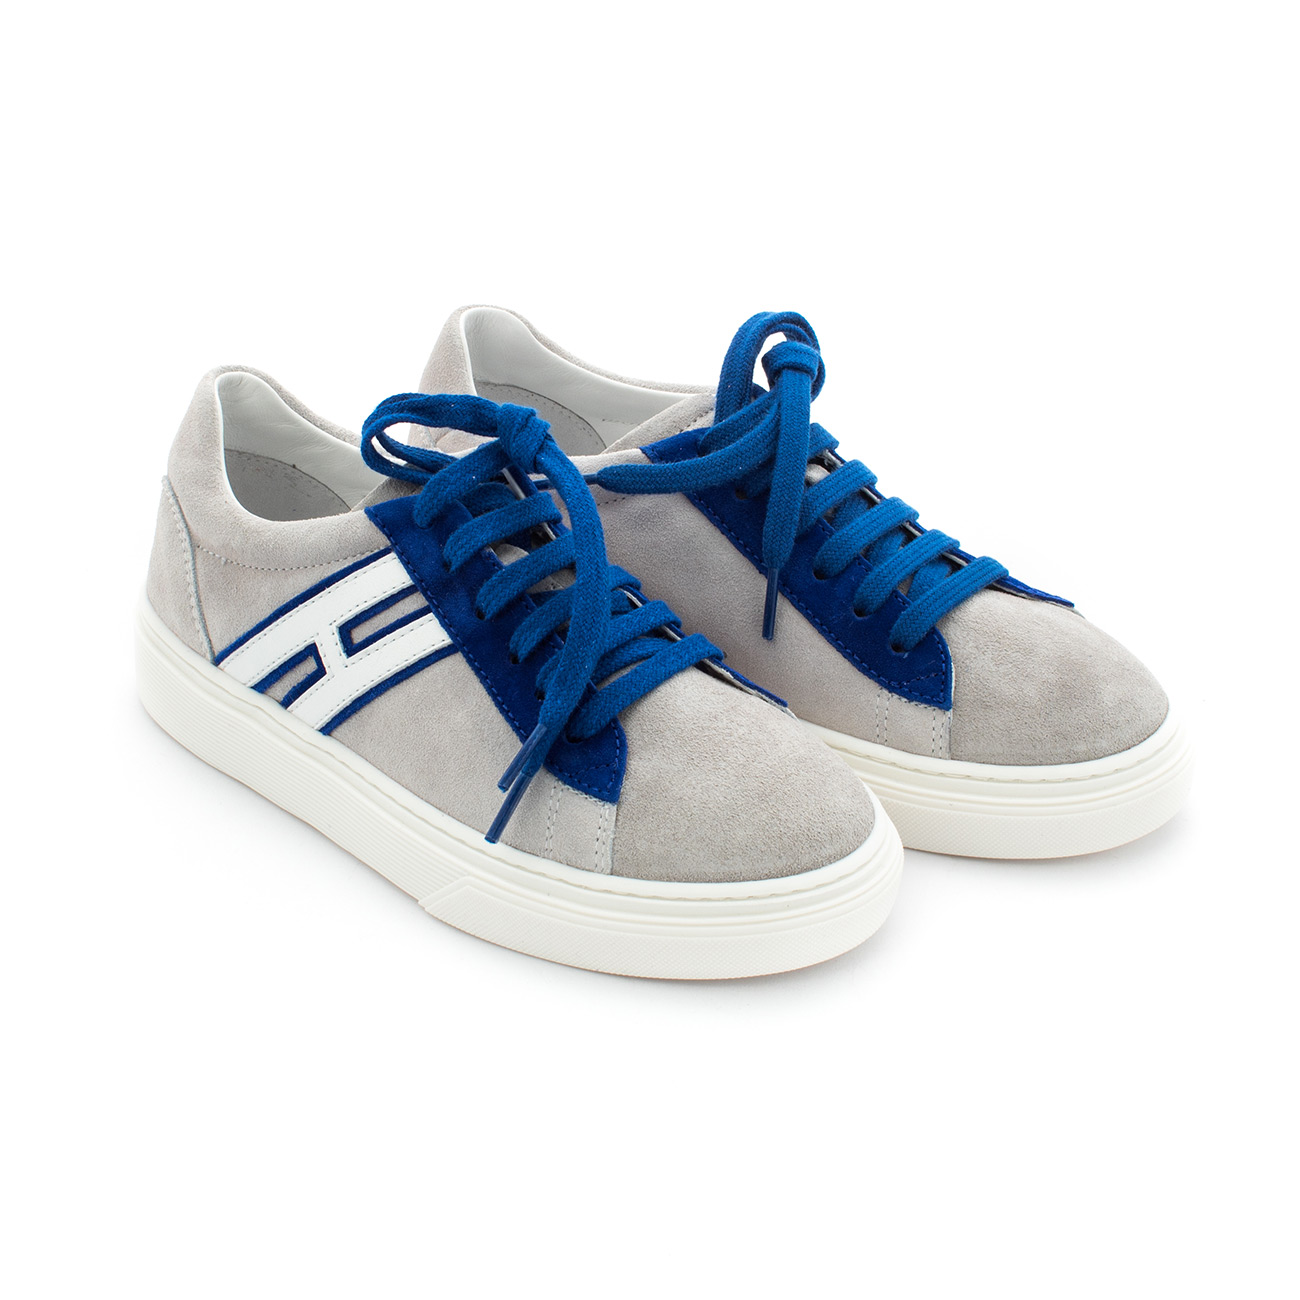 Scarpa Sneaker H365 Grigia E Blu Bambino Teen